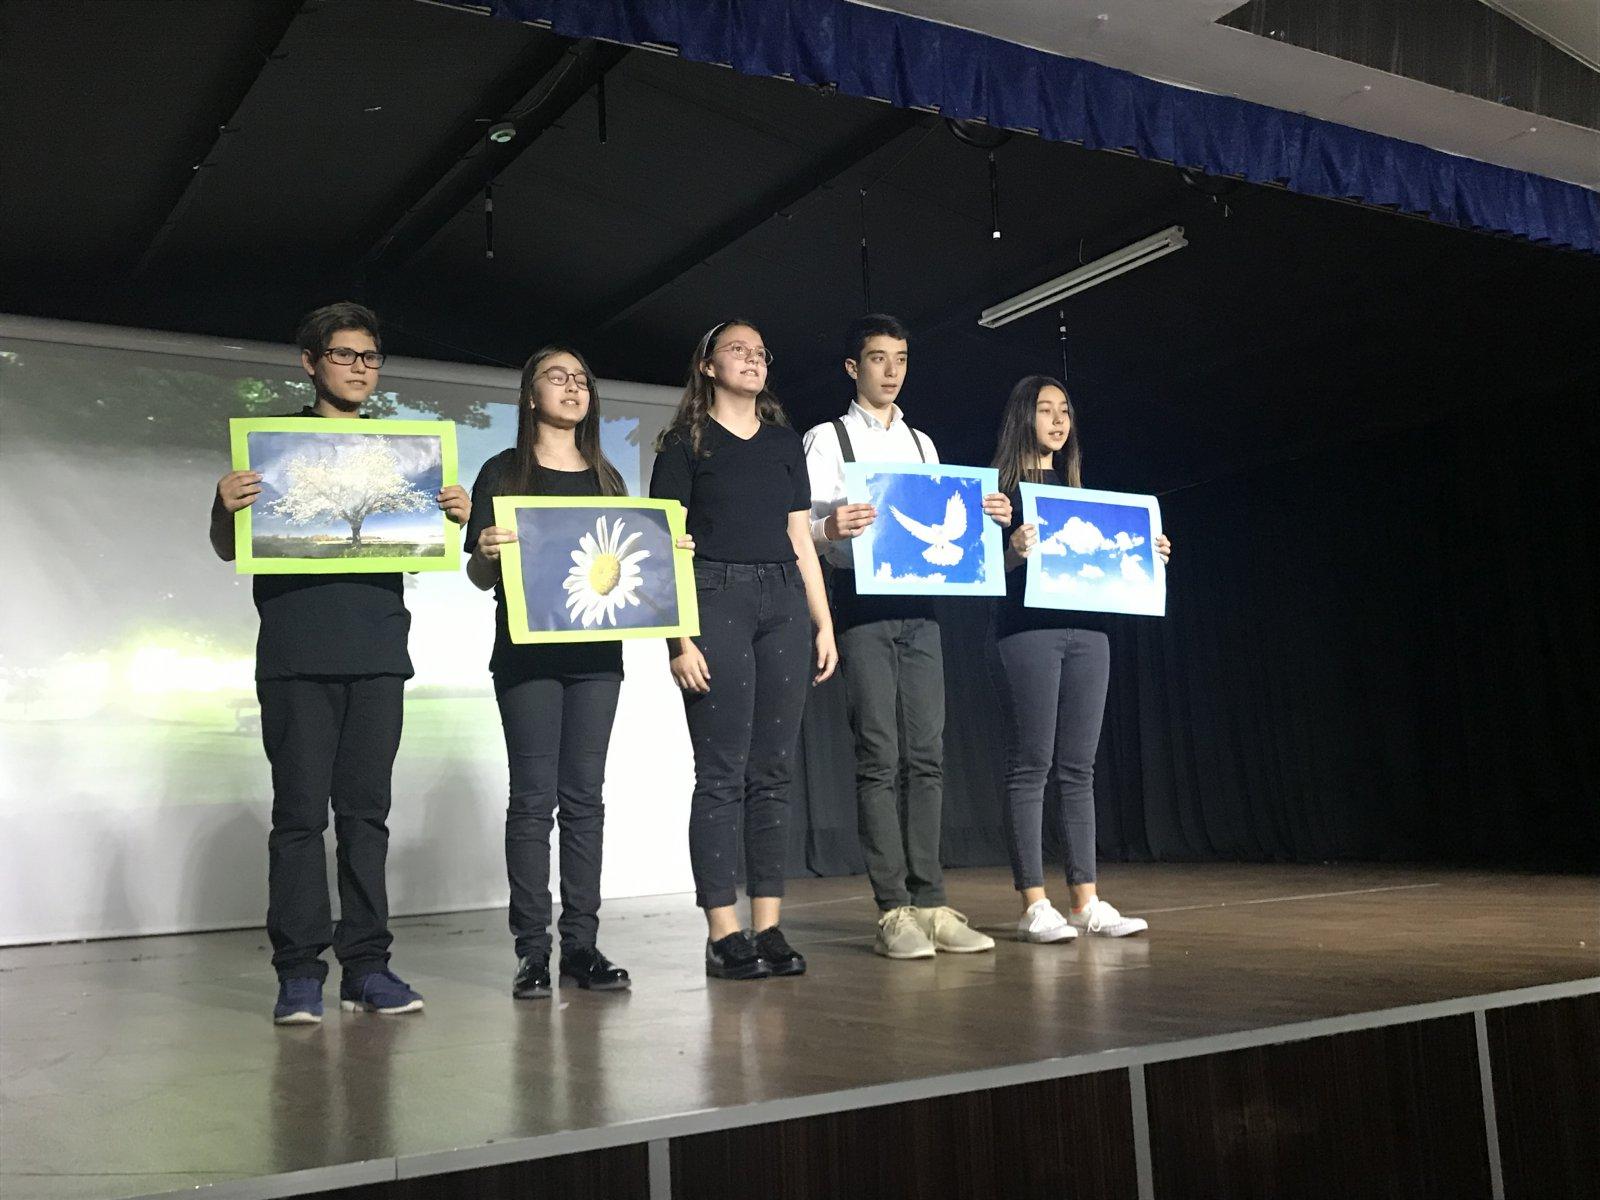 Ortaokul Tiyatro Gösterisi